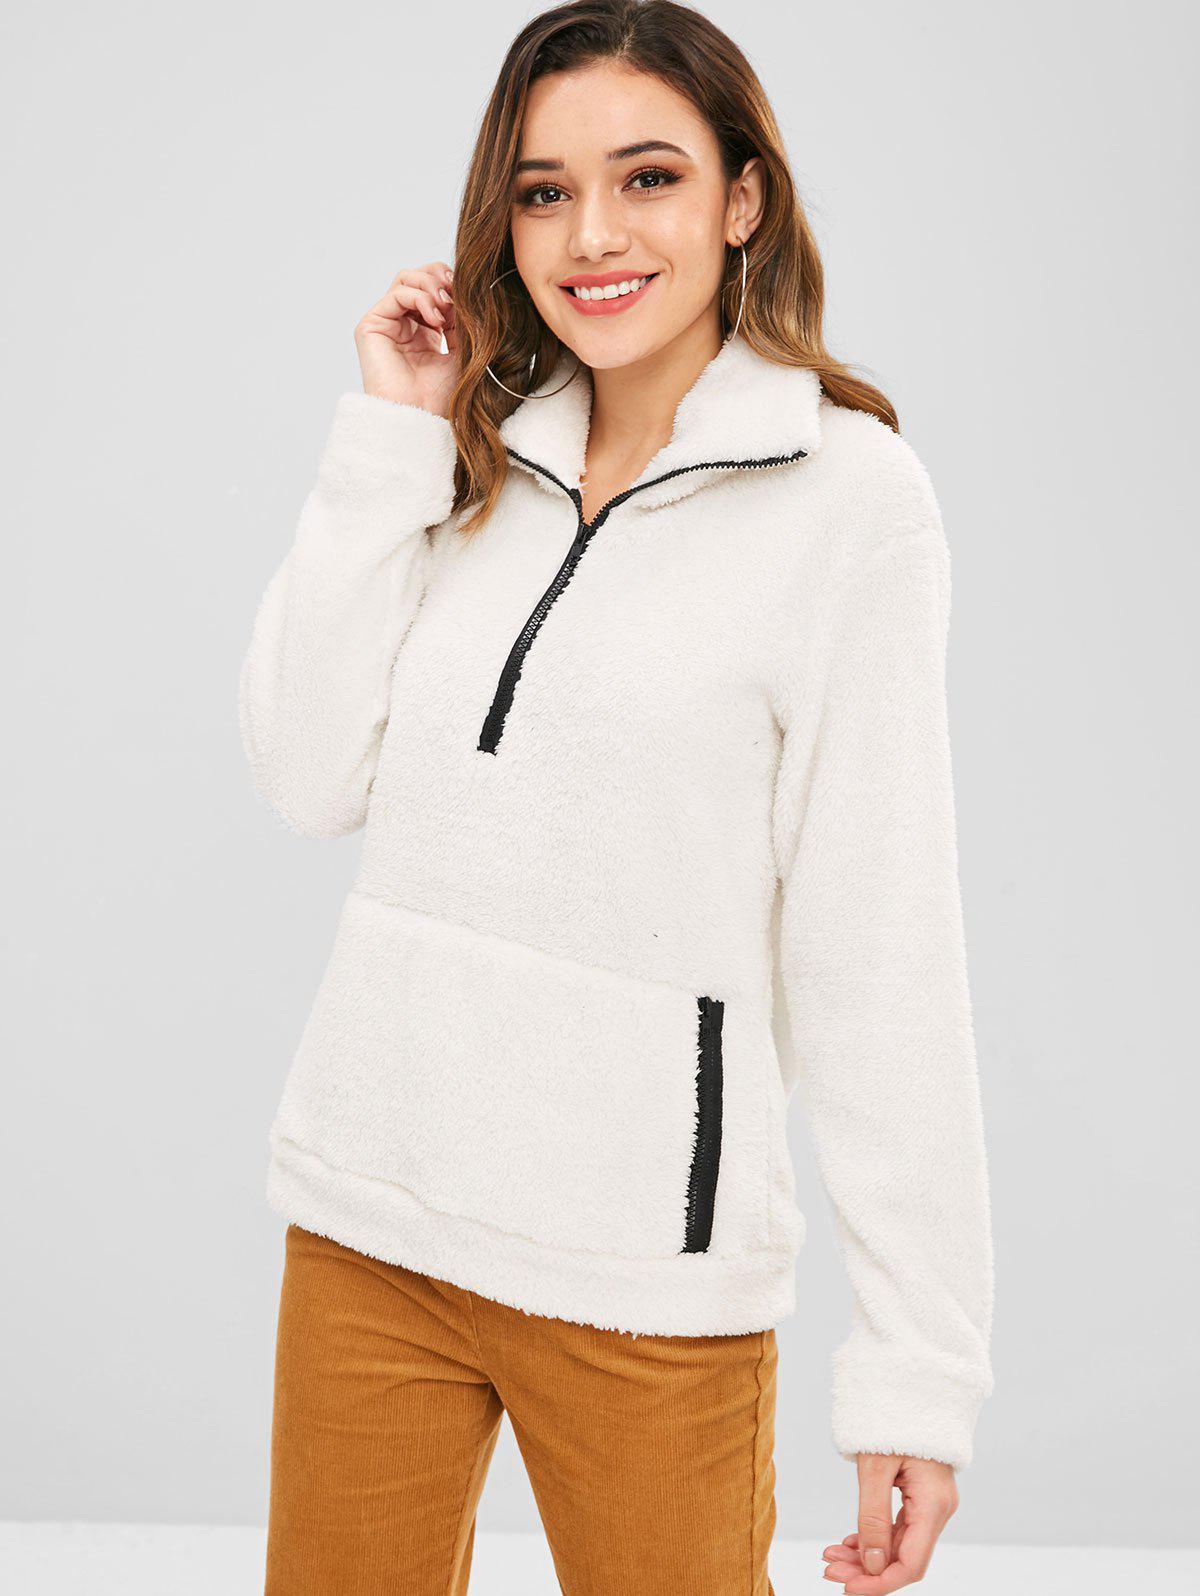 ZAFUL Half Zip Faux Fur Sweatshirt, White